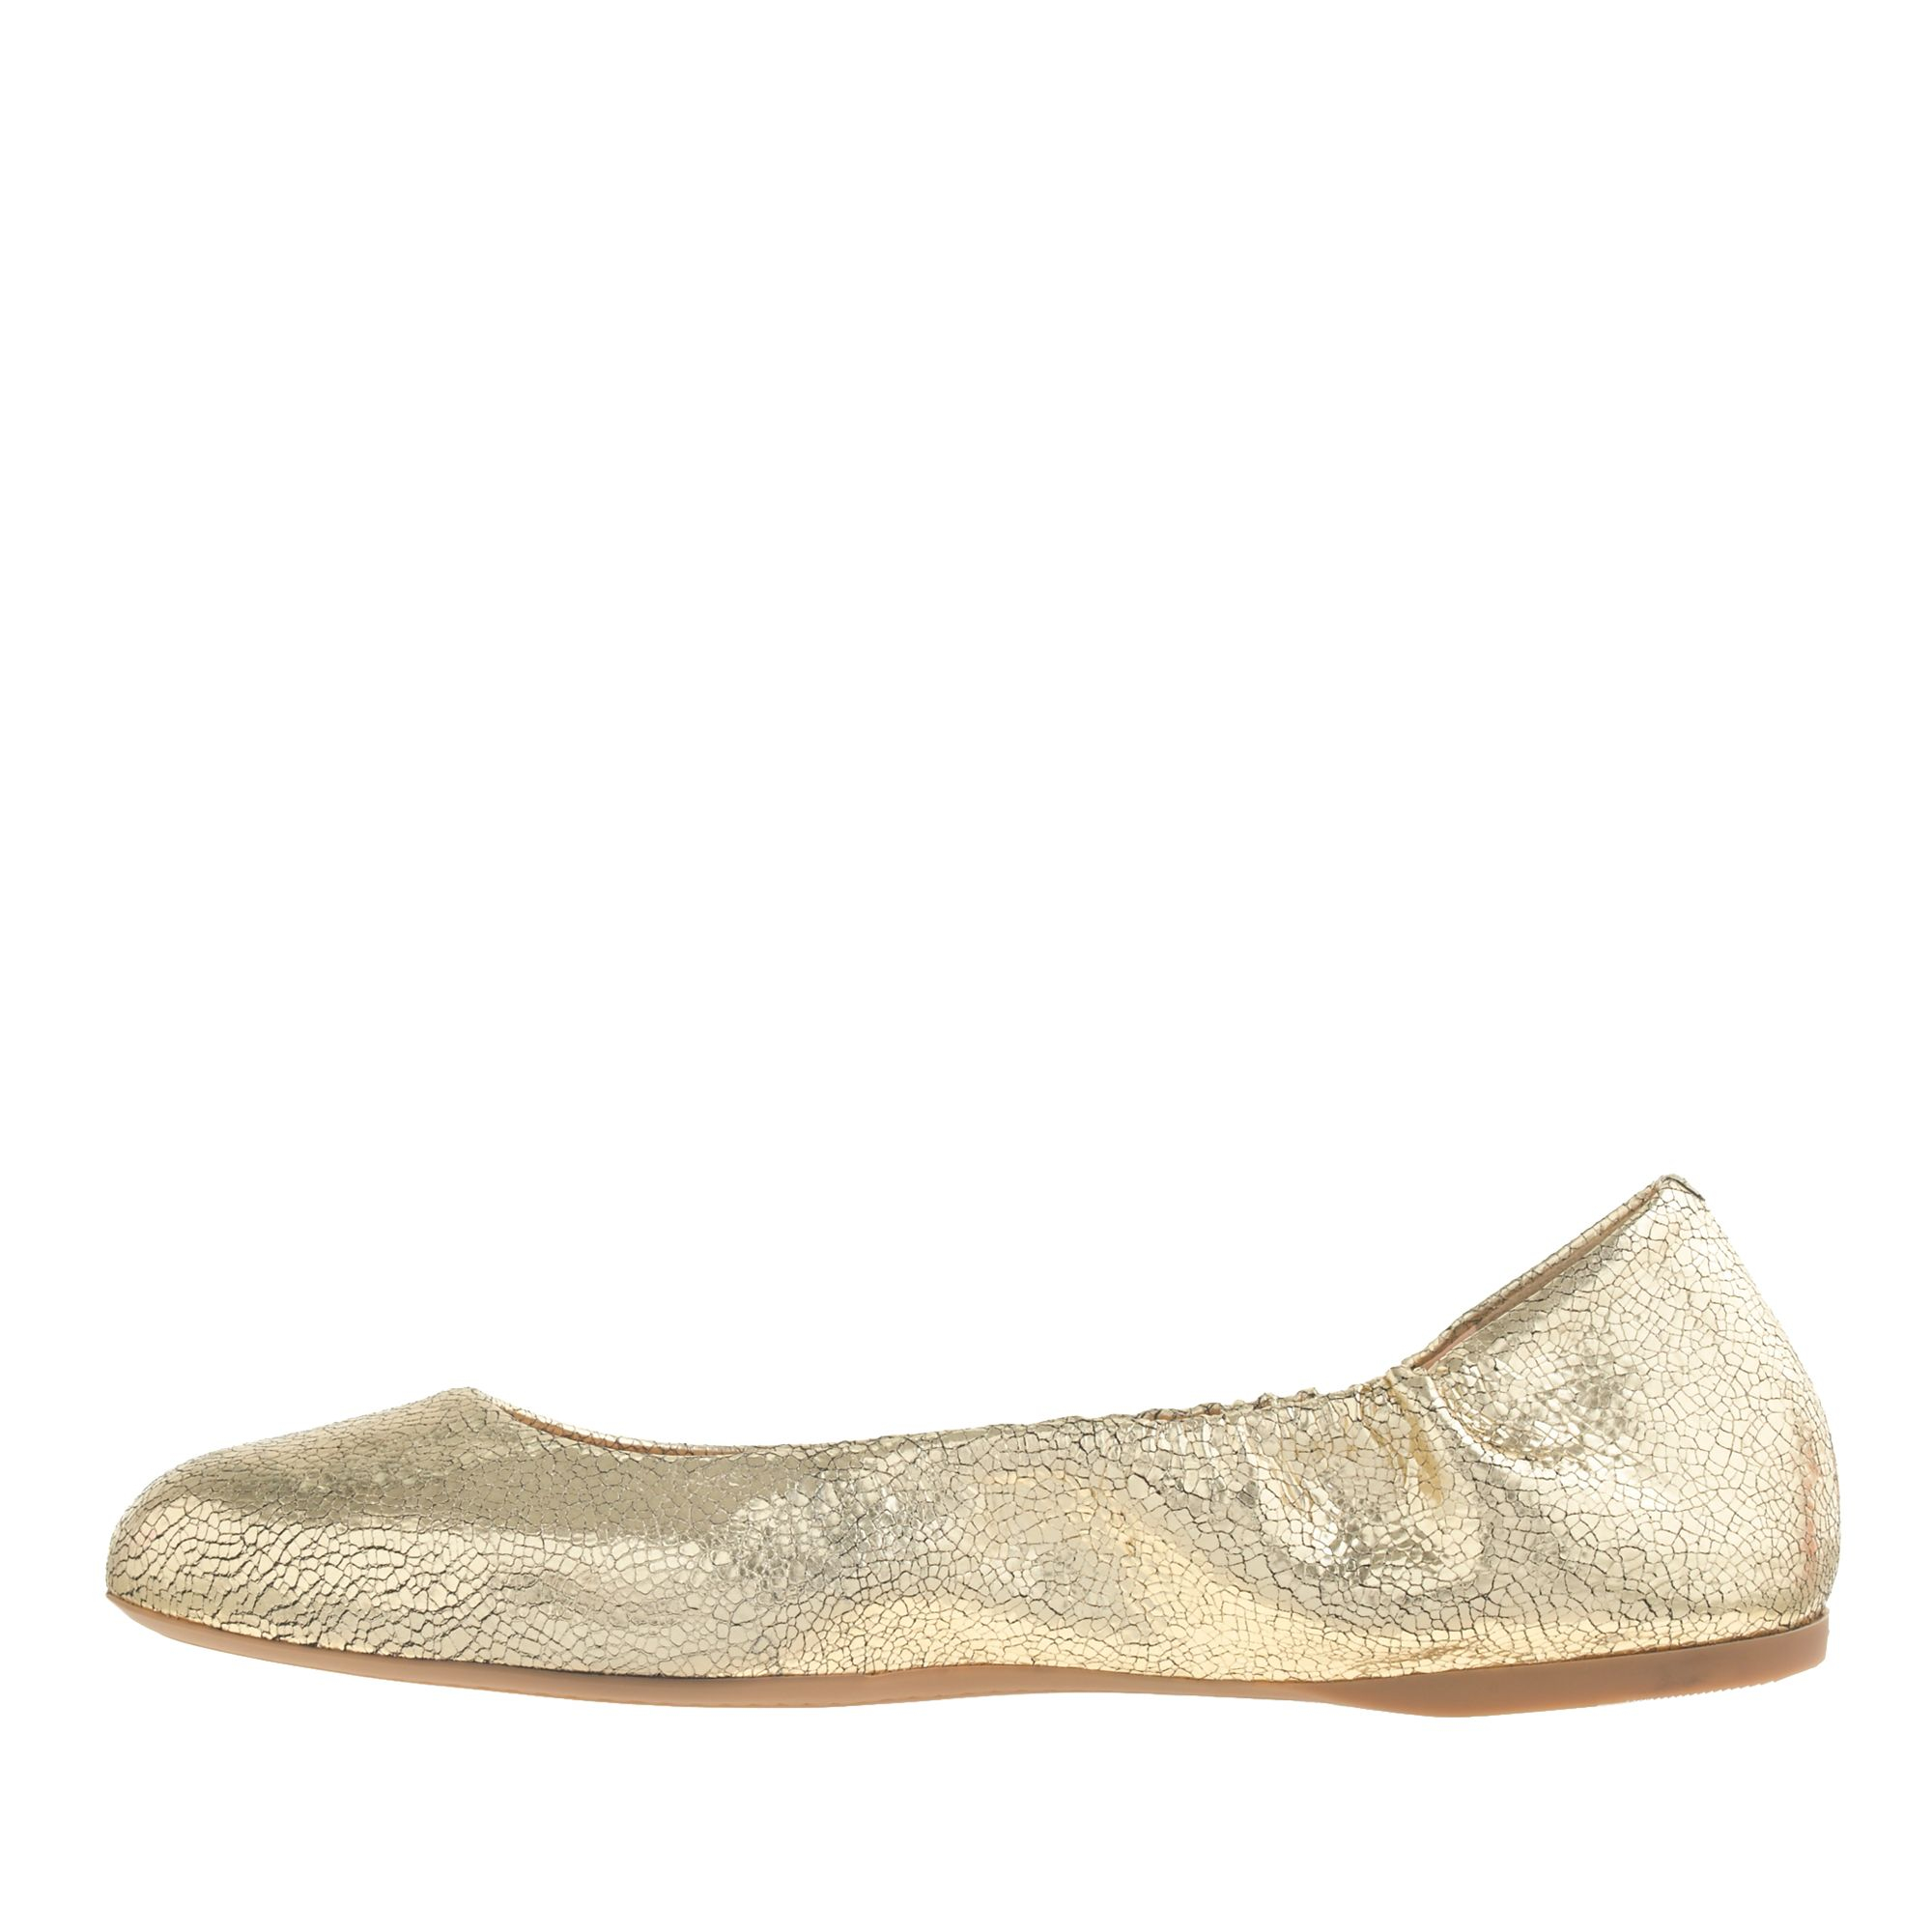 Lyst - J.Crew Preorder Emma Crackled Metallic Leather Ballet Flats ... 0d3fecb5f